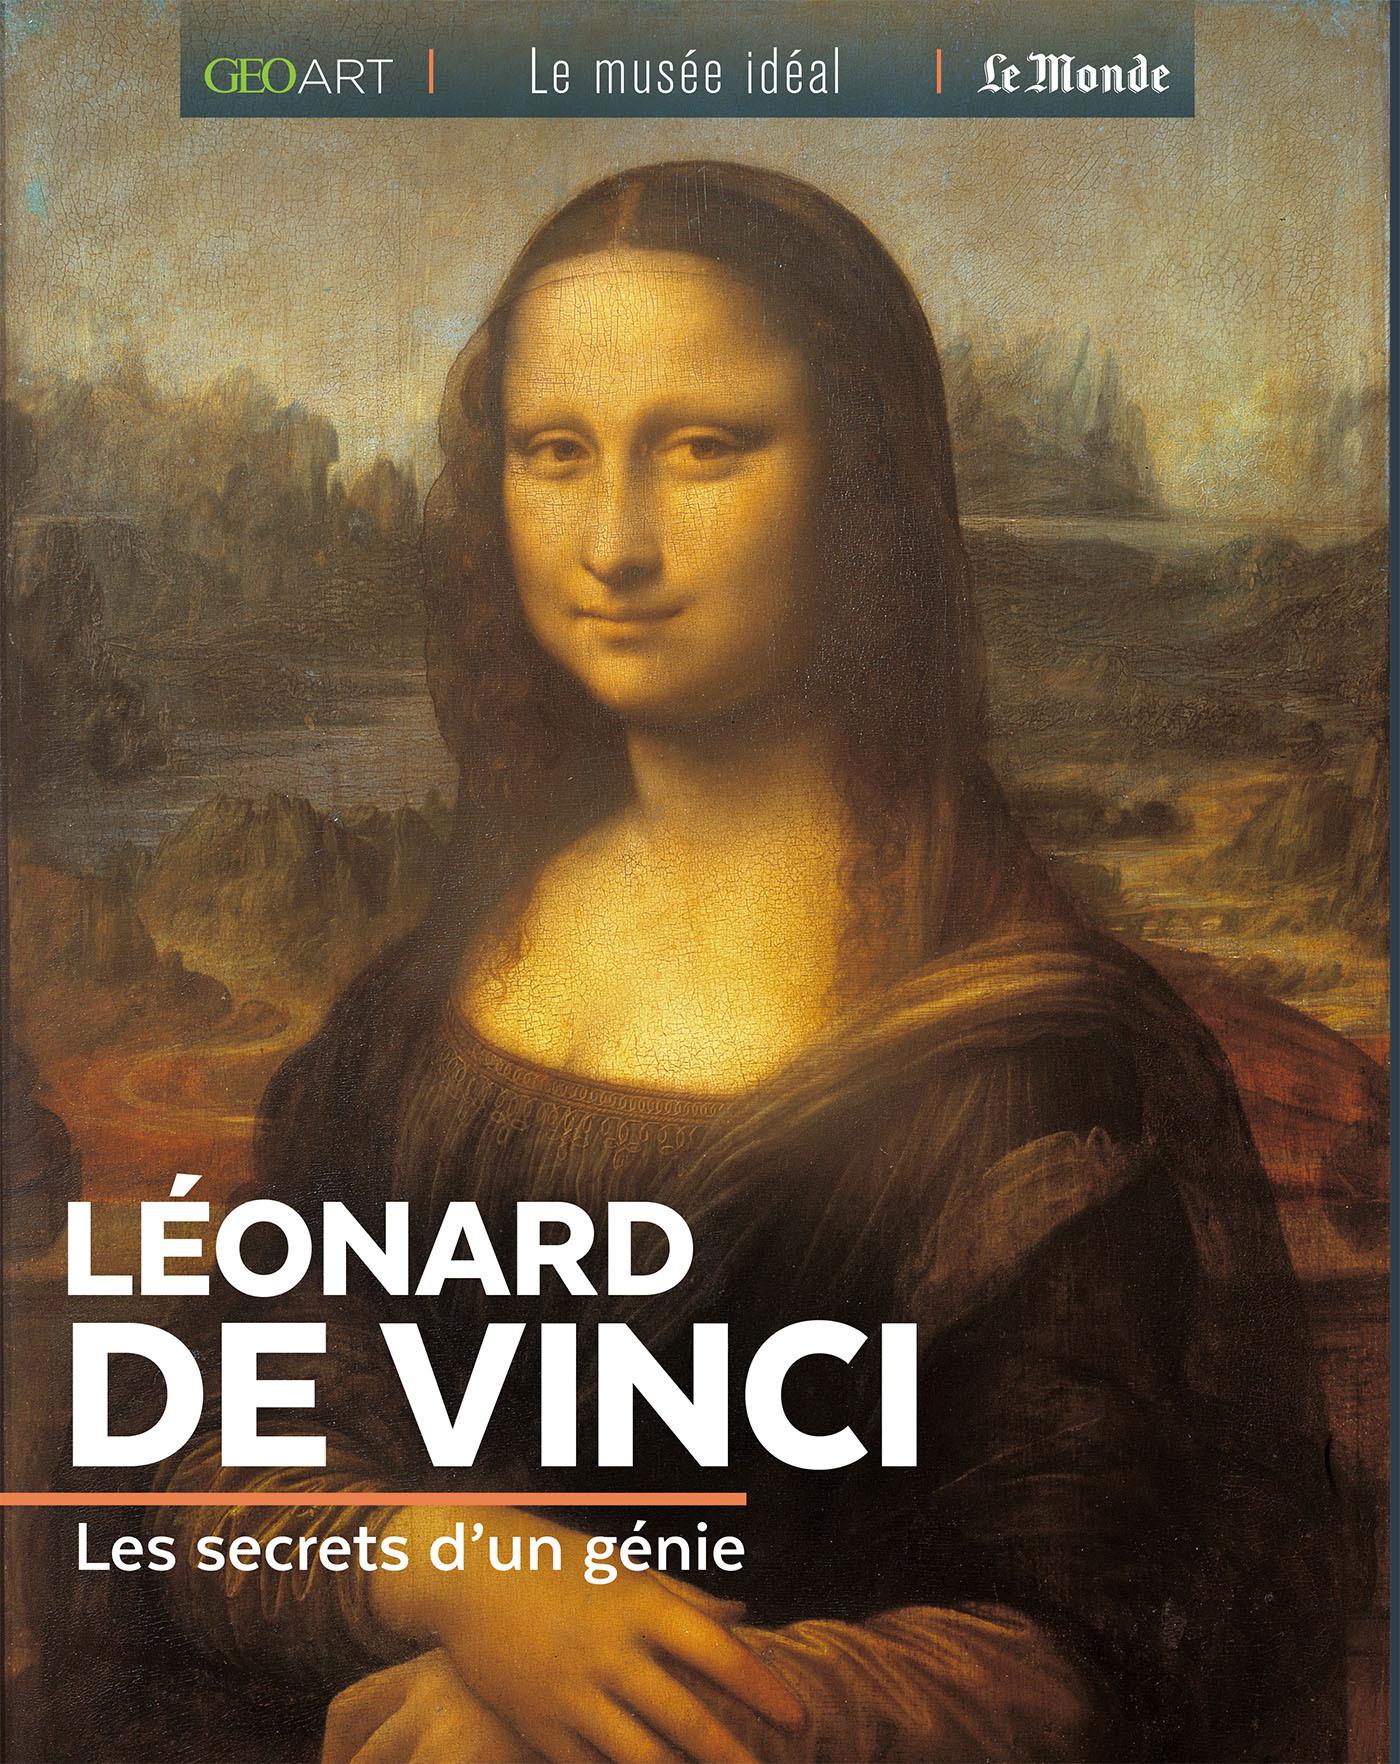 LEONARD DE VINCI, LES SECRETS D'UN GENIE